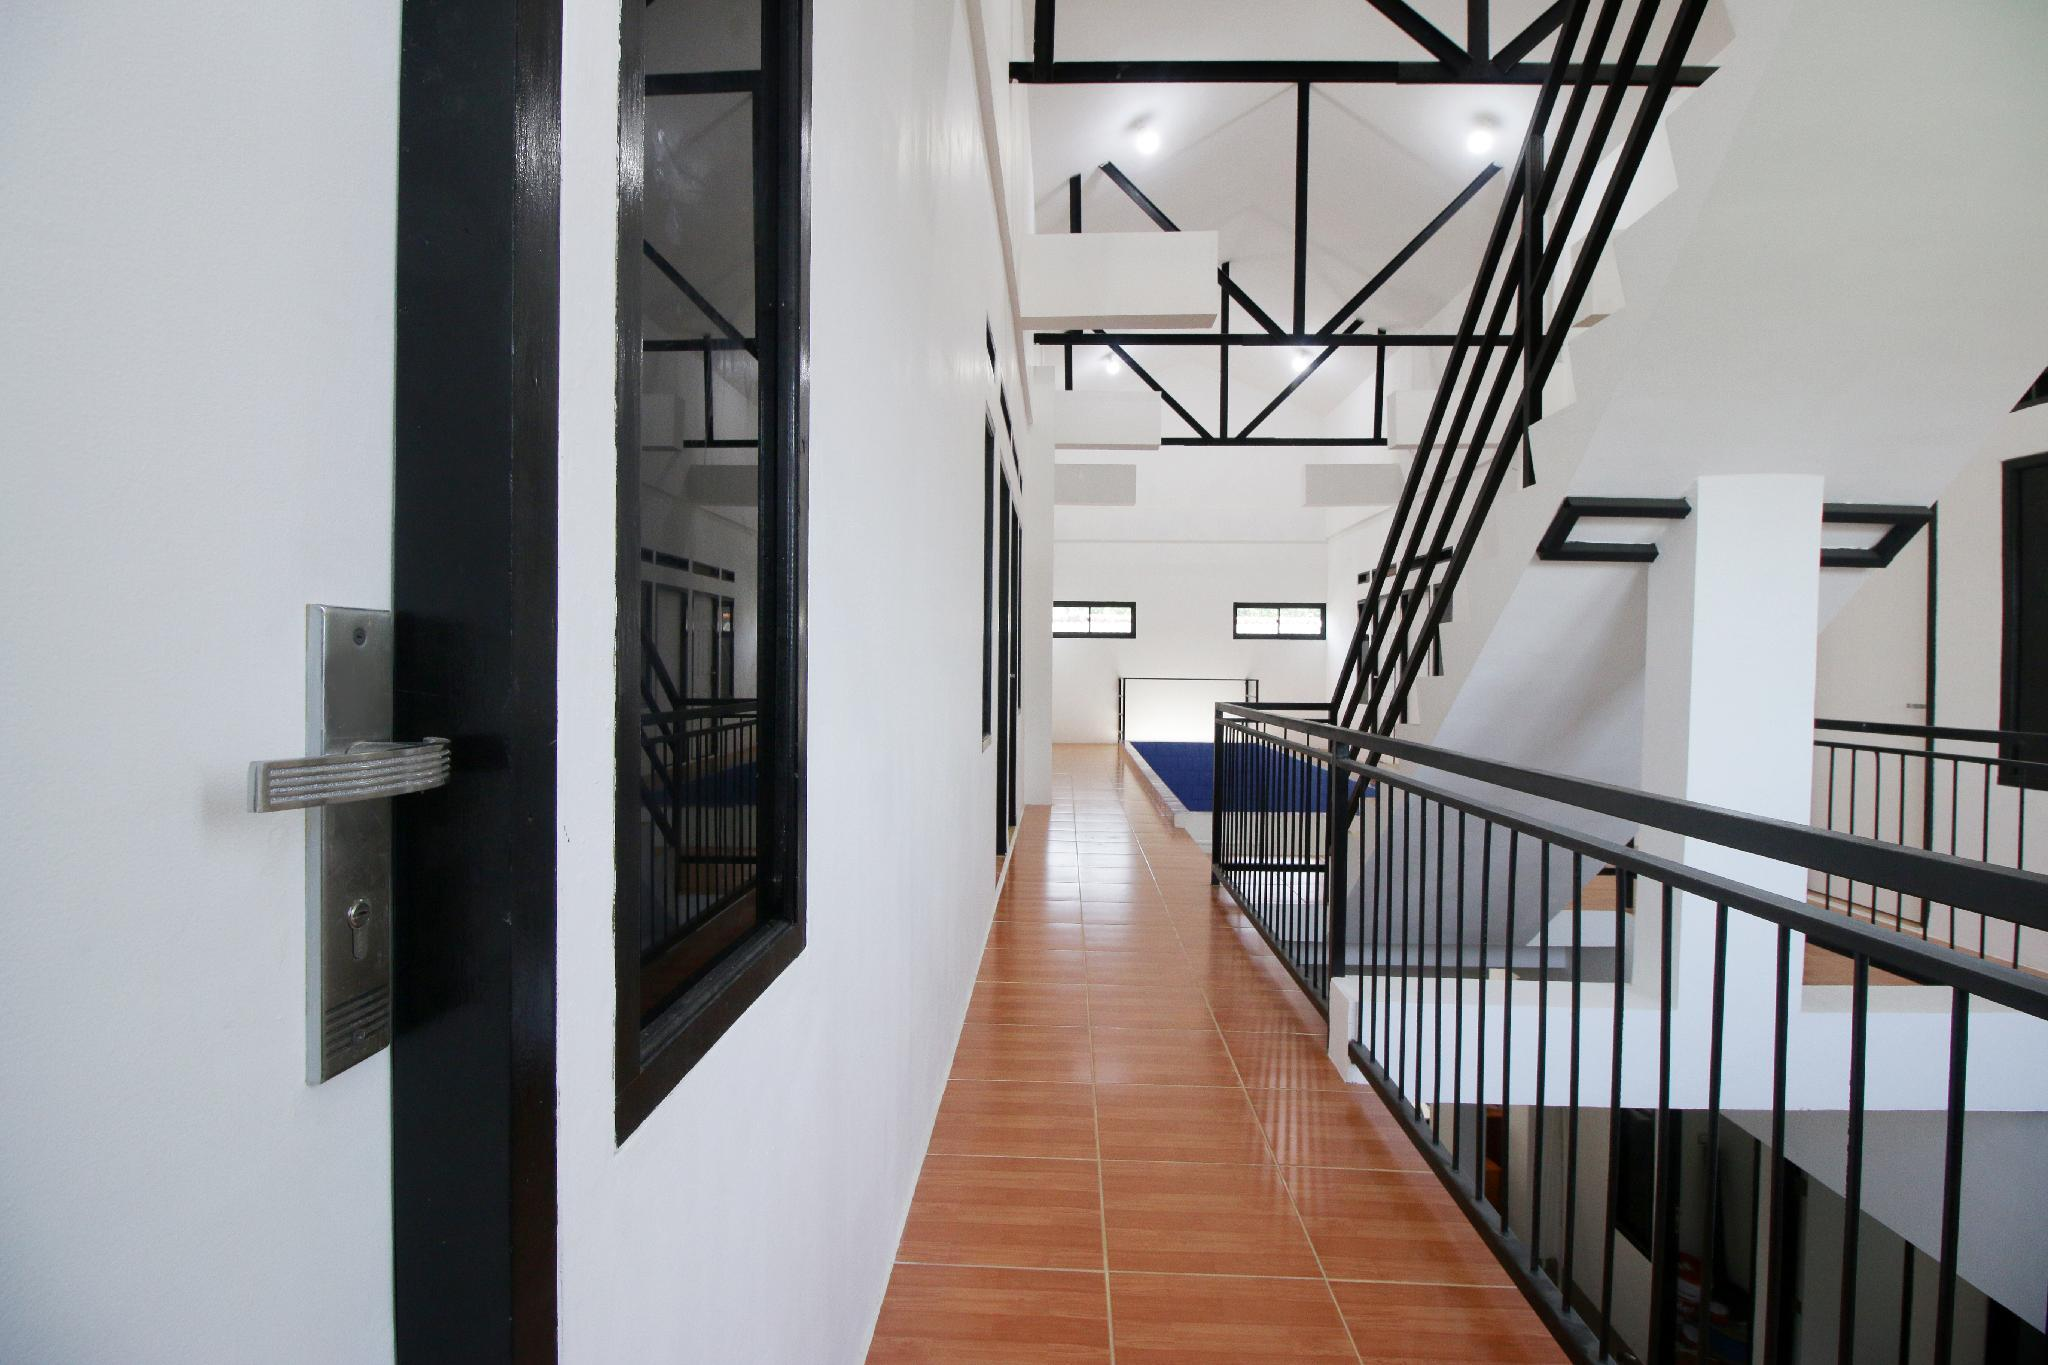 Kamar Keluarga Kebon Jeruk, Jakarta Barat